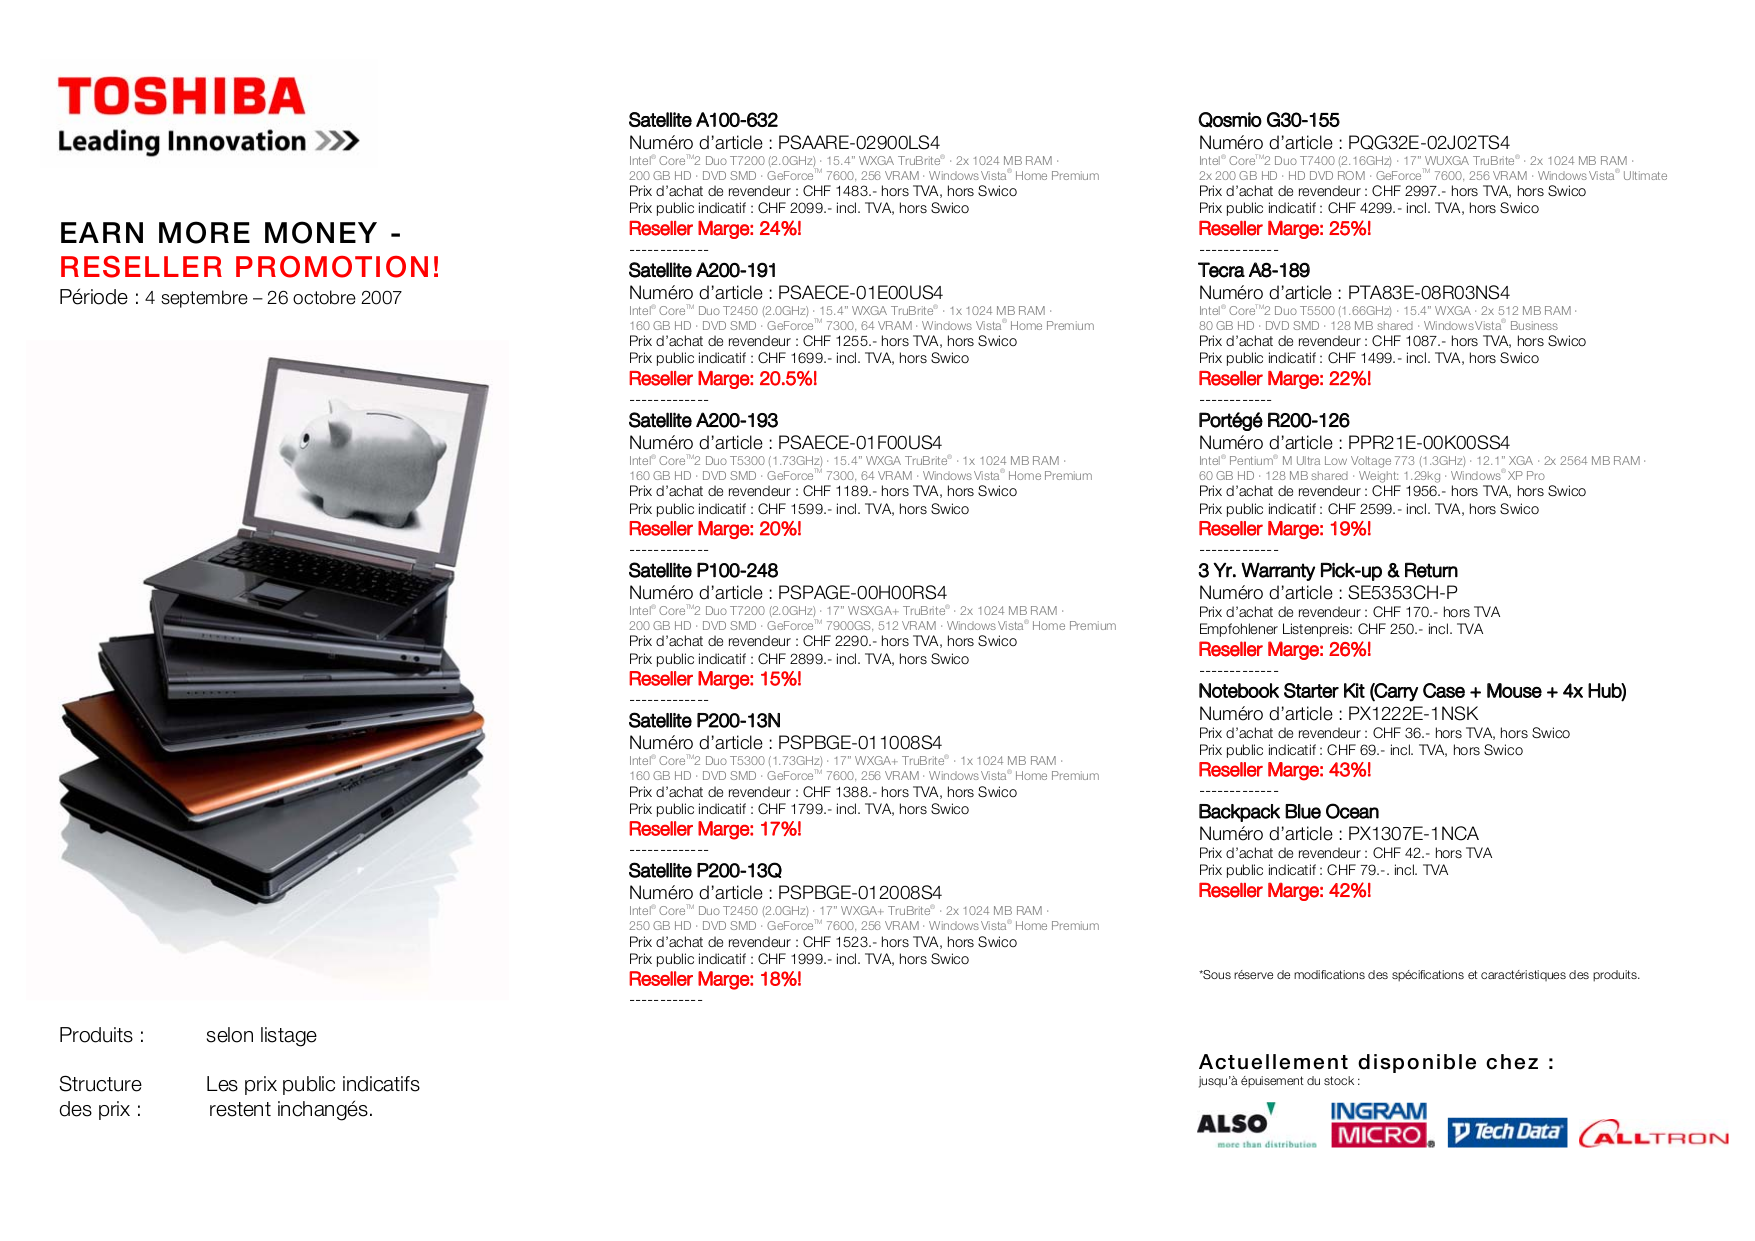 toshiba laptop c660 manual pdf